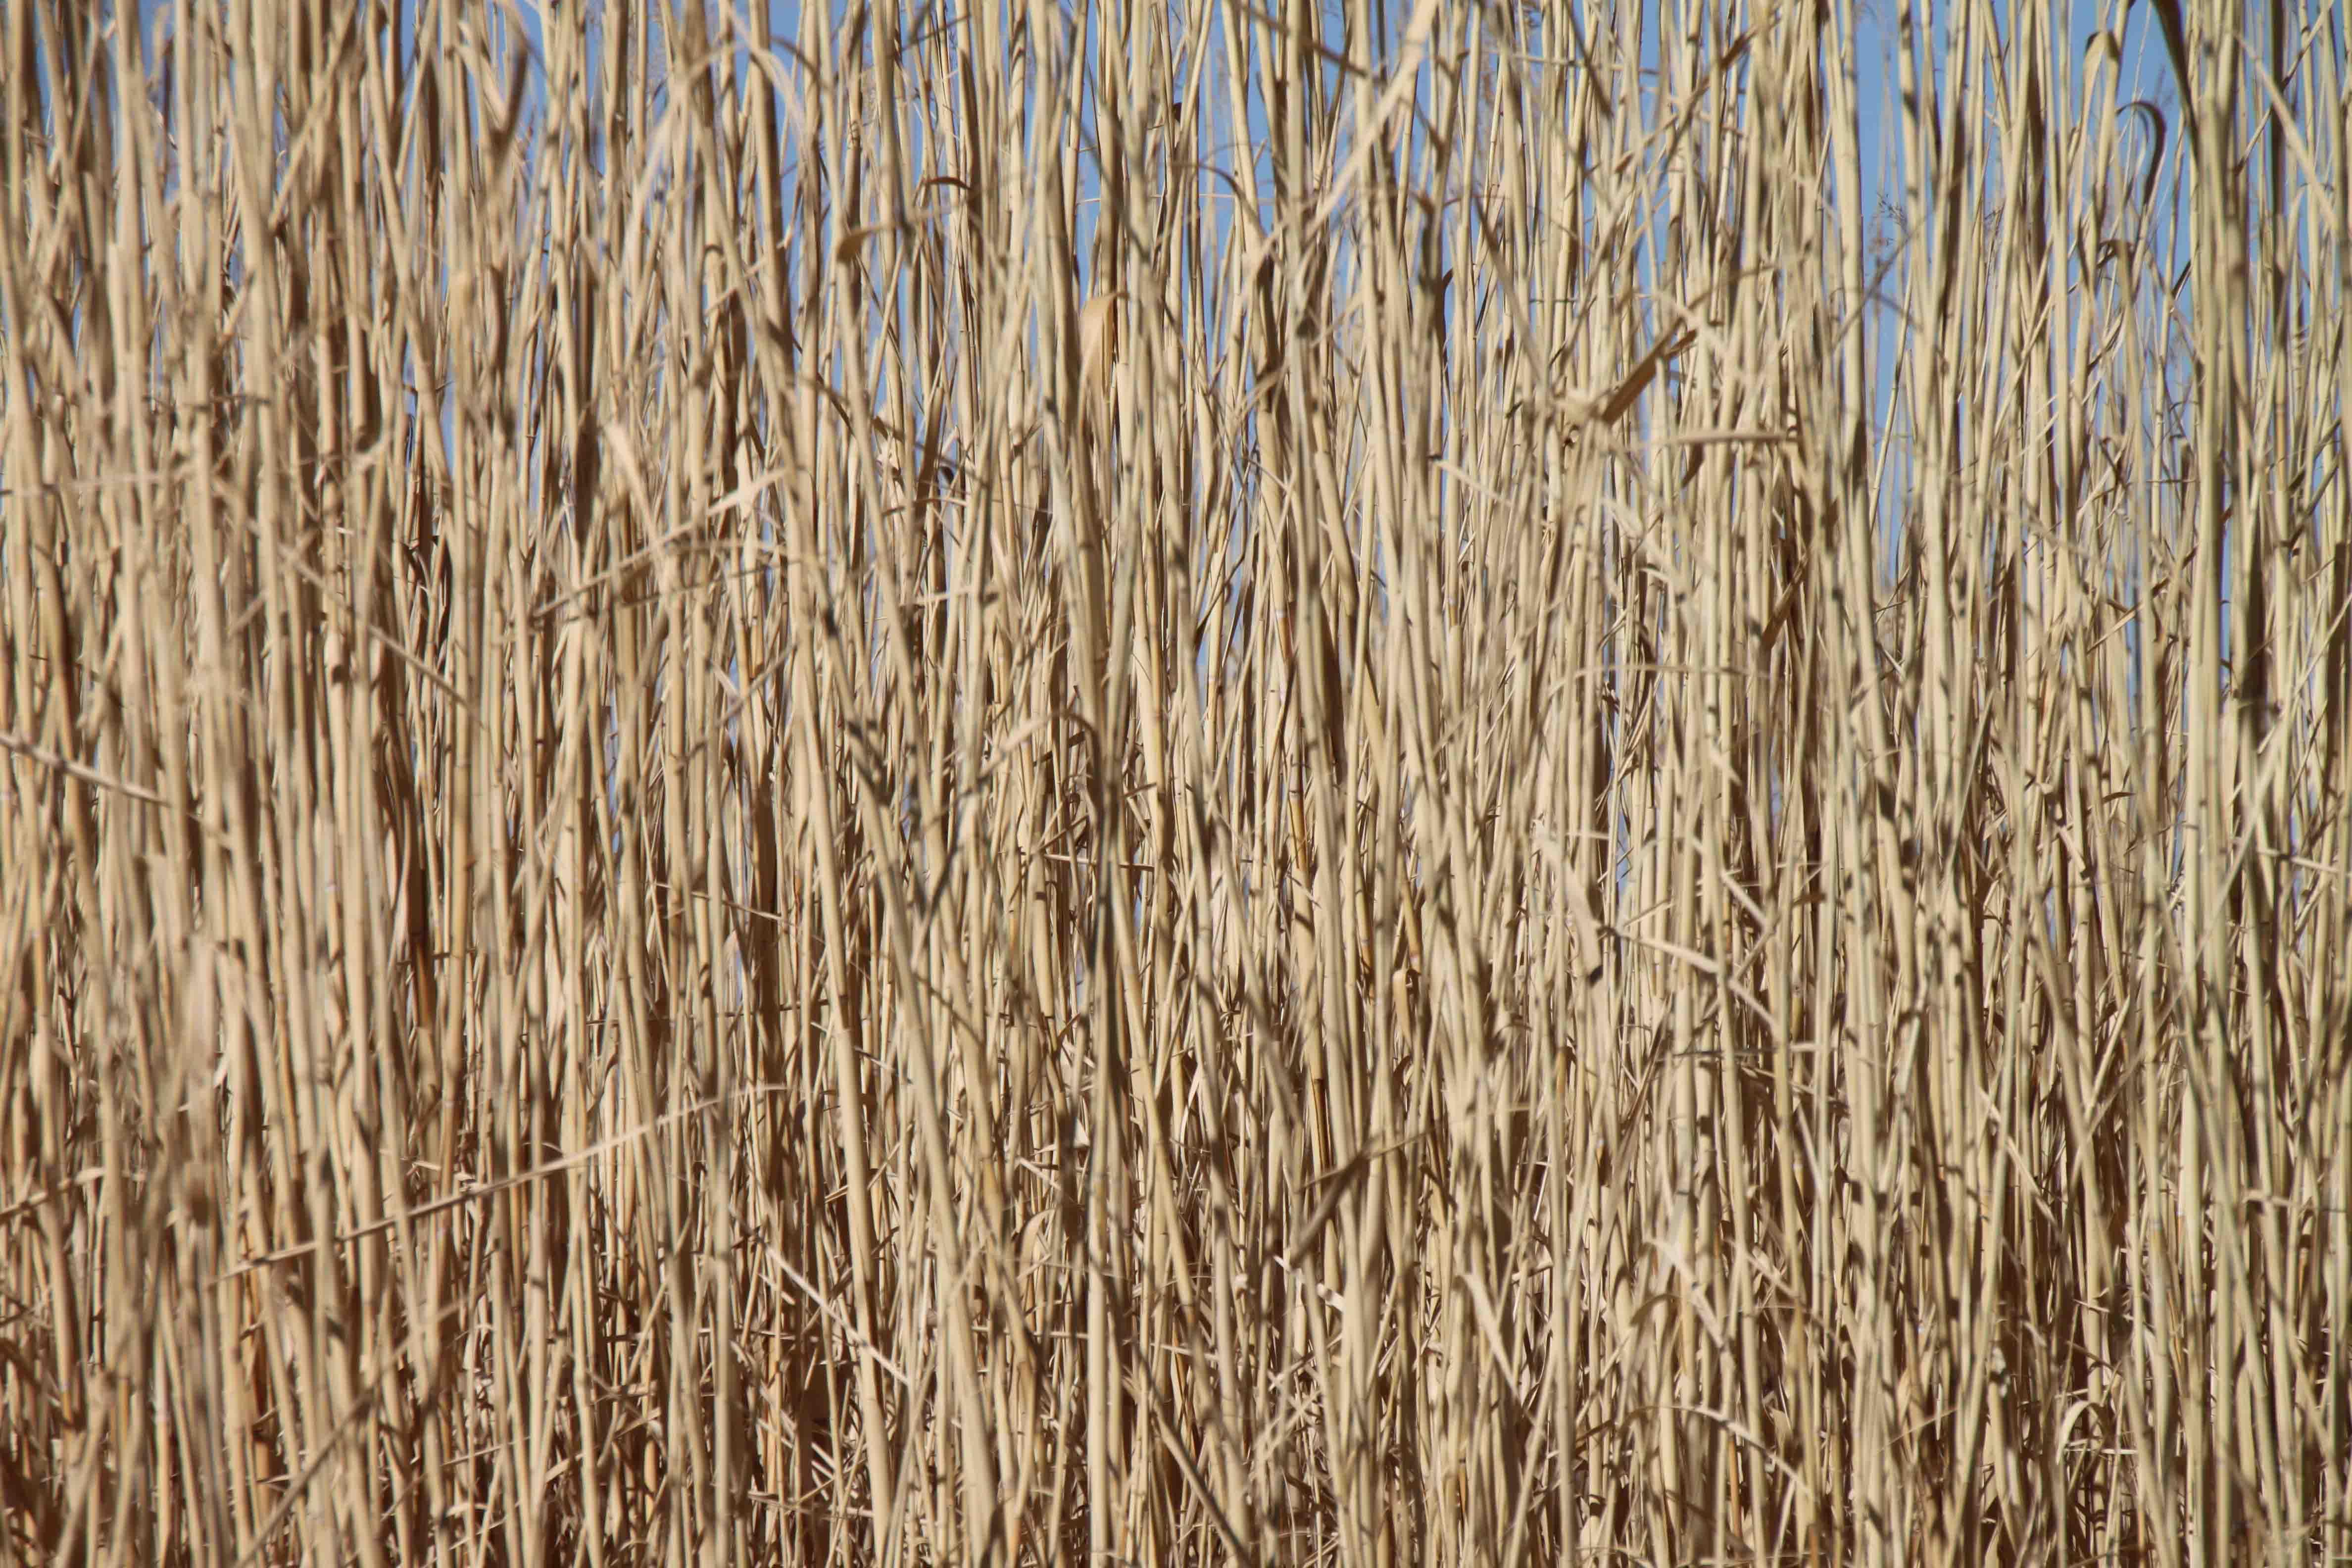 wheat grass at balmorhea state park